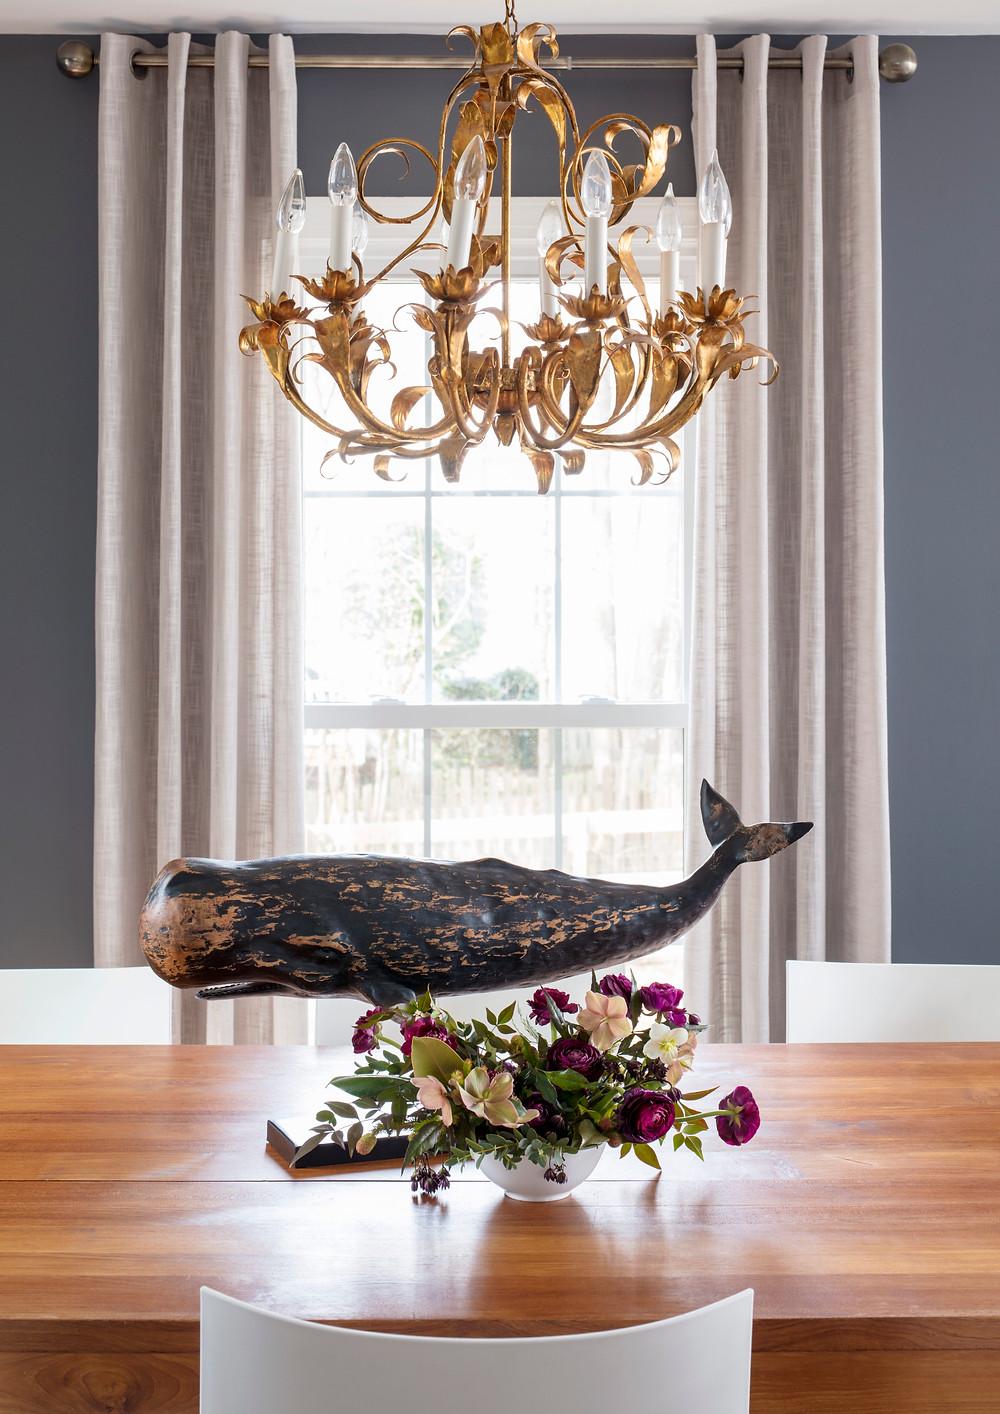 gold vintage chandelier, gray walls, teak dining table